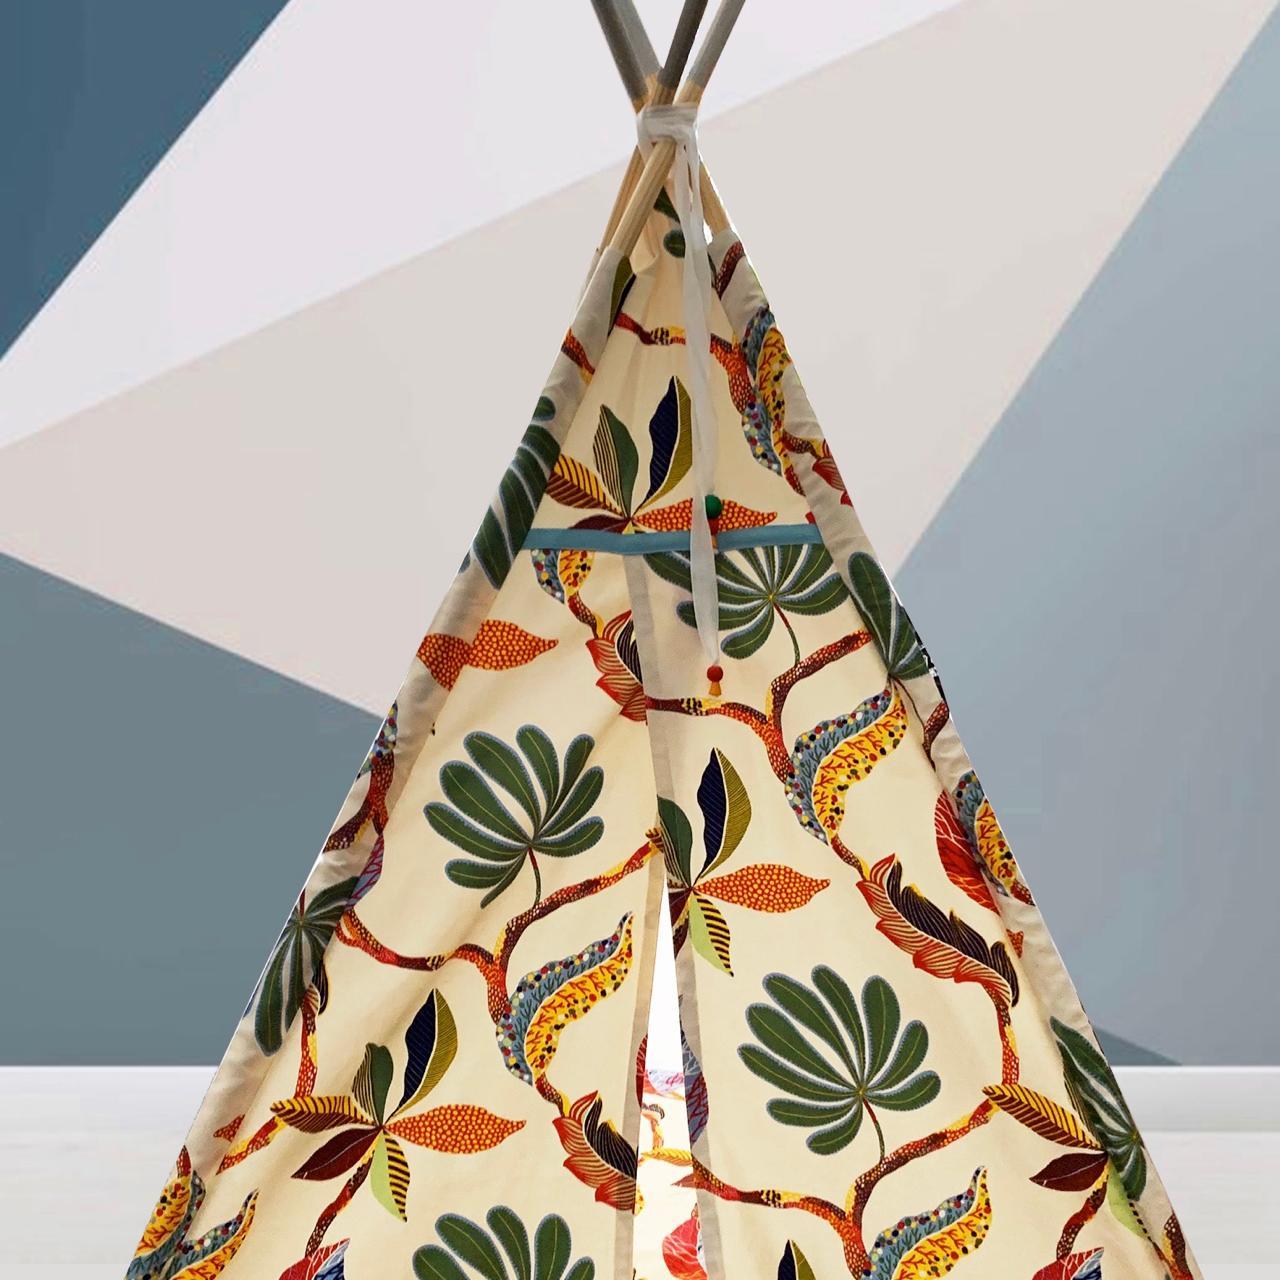 Jungle motif teepee for sale